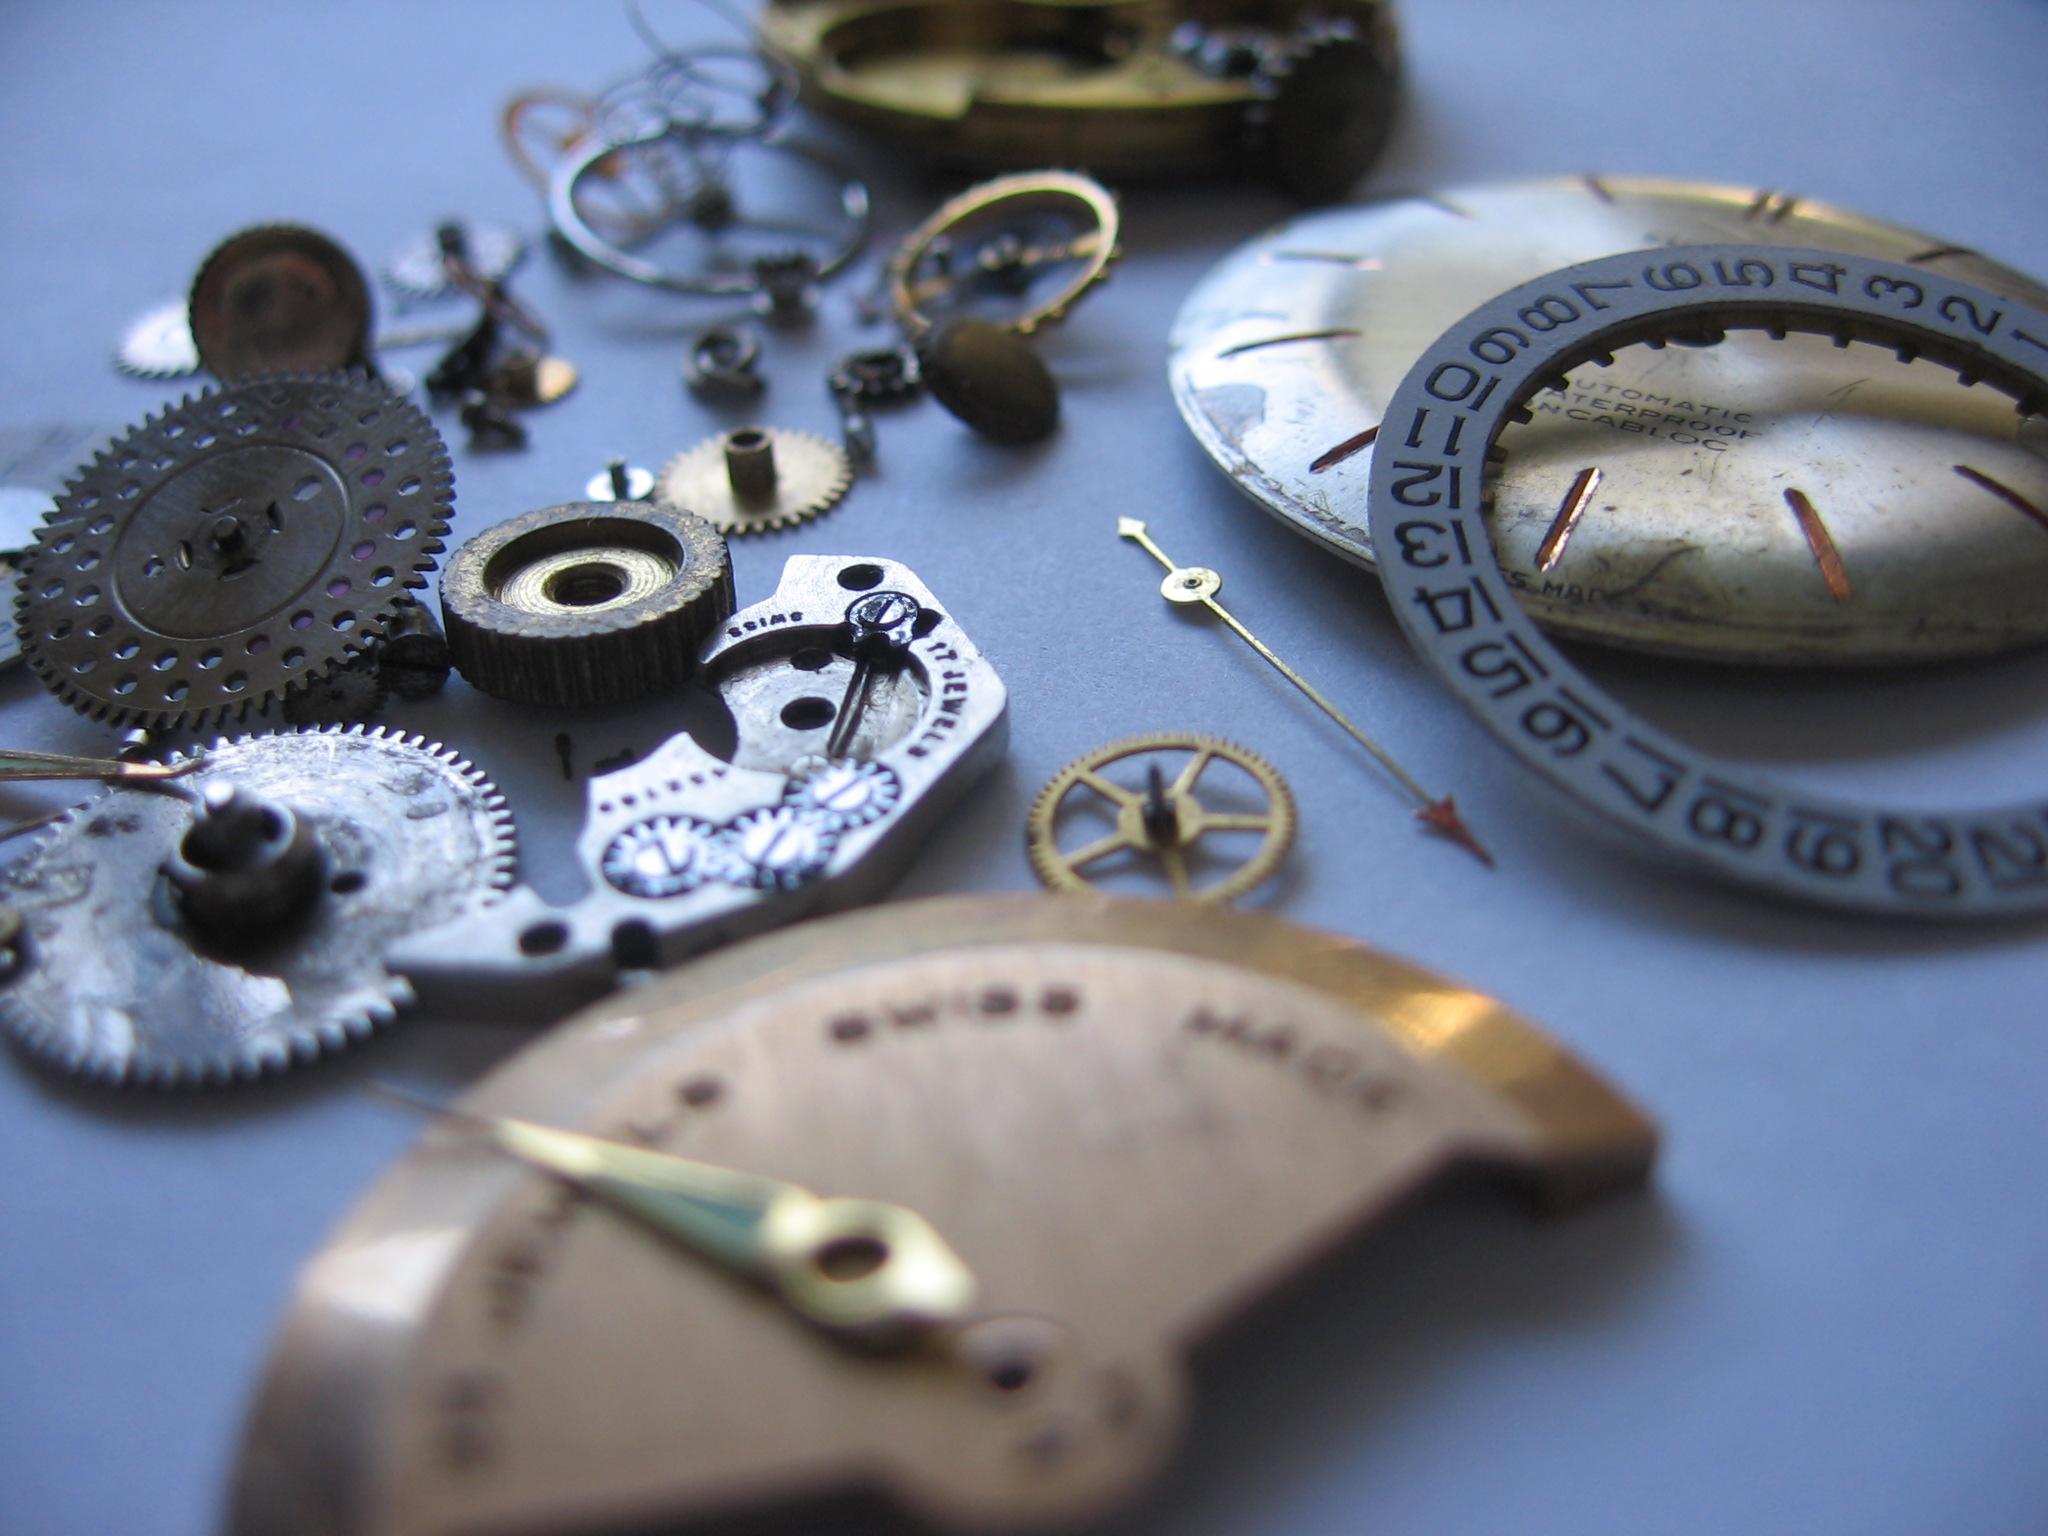 Watch Repair Las Vegas - M&I Watch, Clock & Jewelry Experts